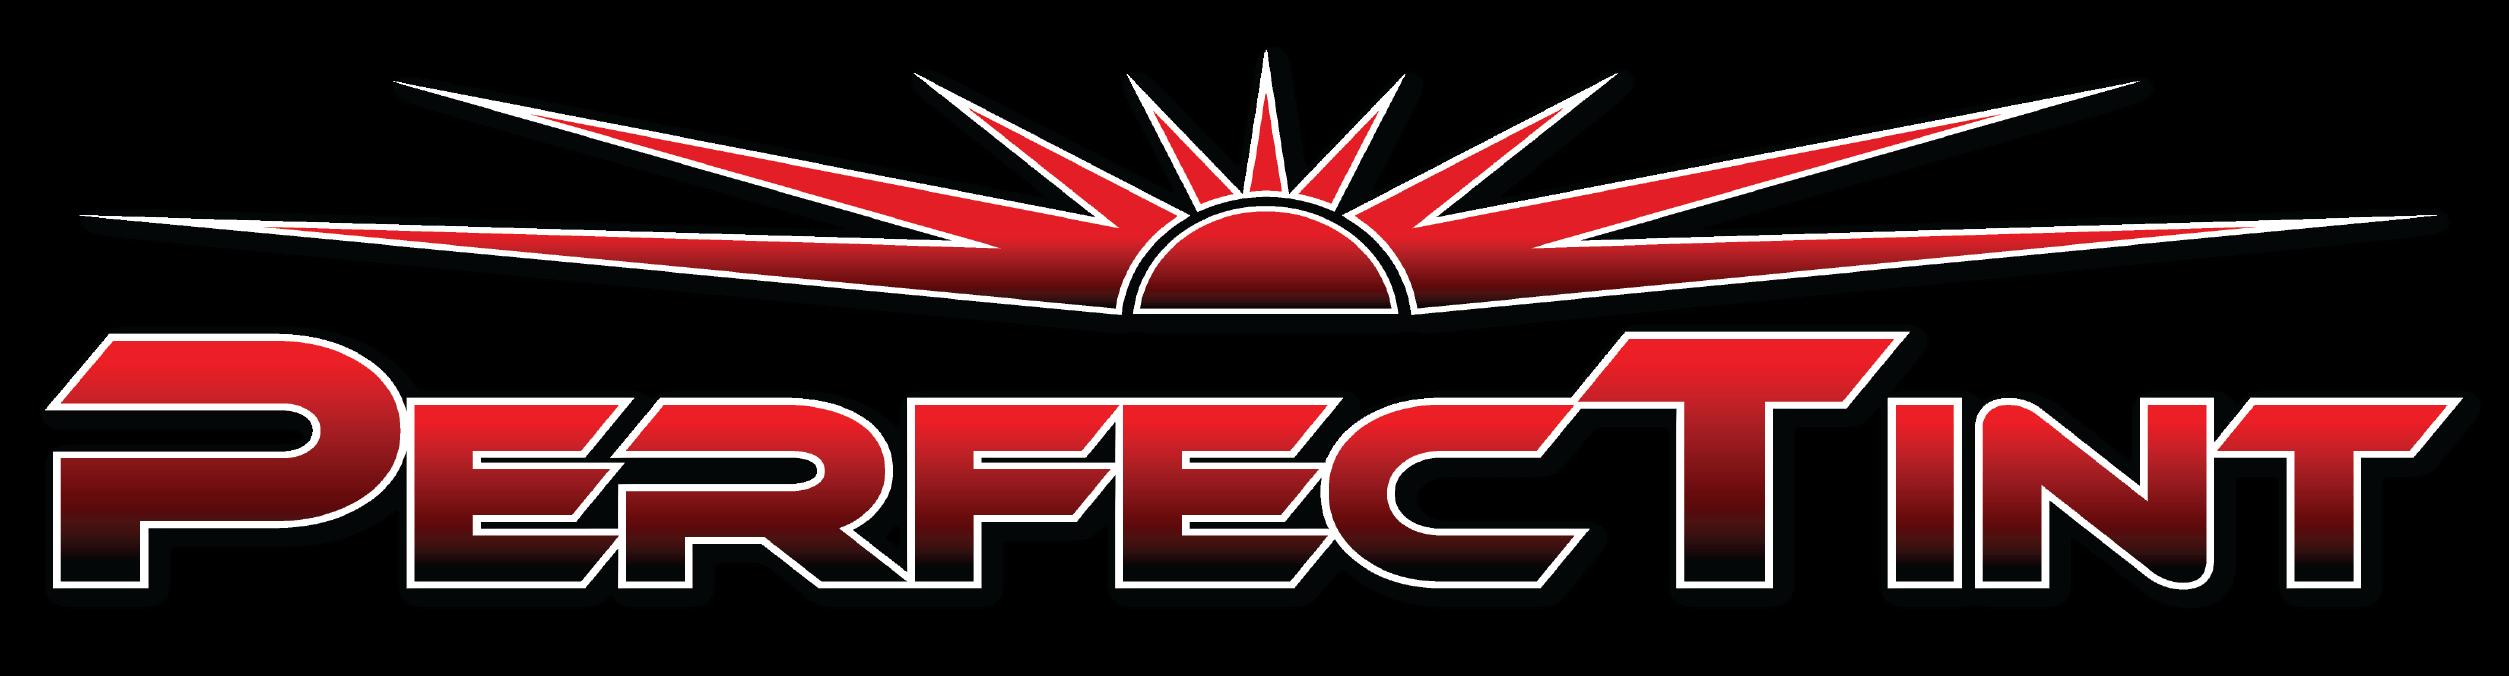 Website_Logo_Revised_2017_600x150